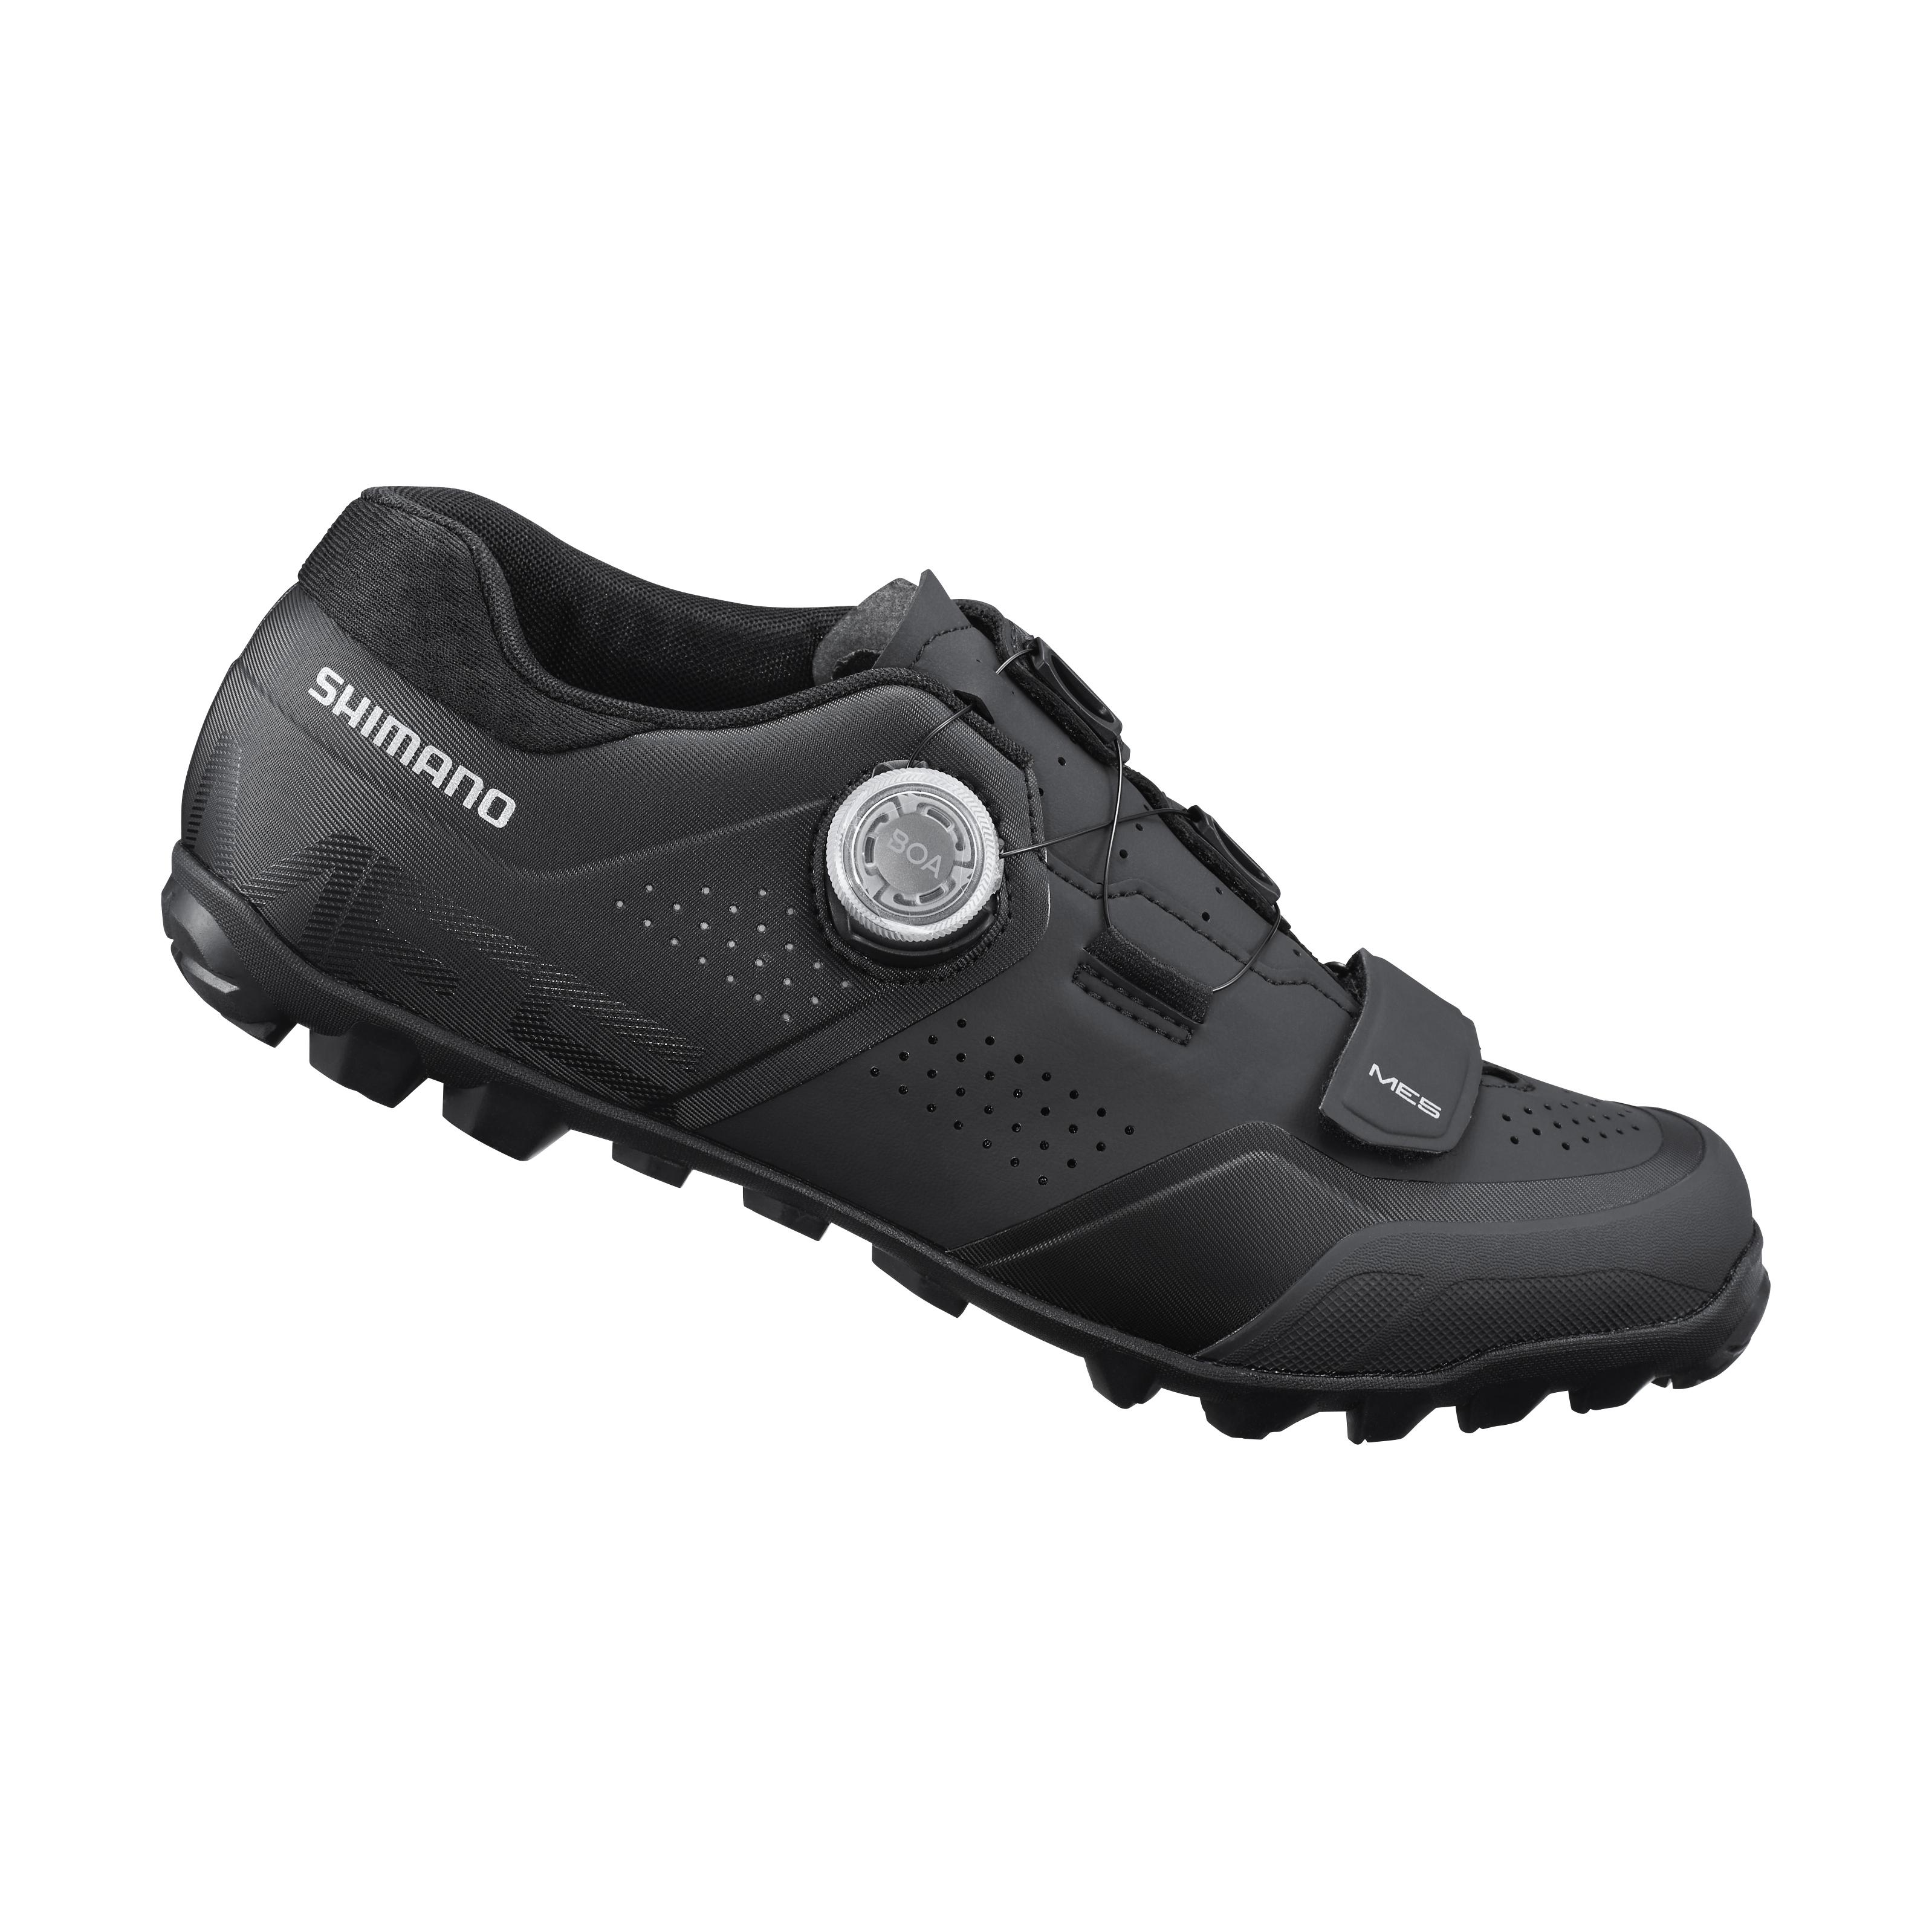 SHIMANO MTB obuv SH-ME502, černá, 40